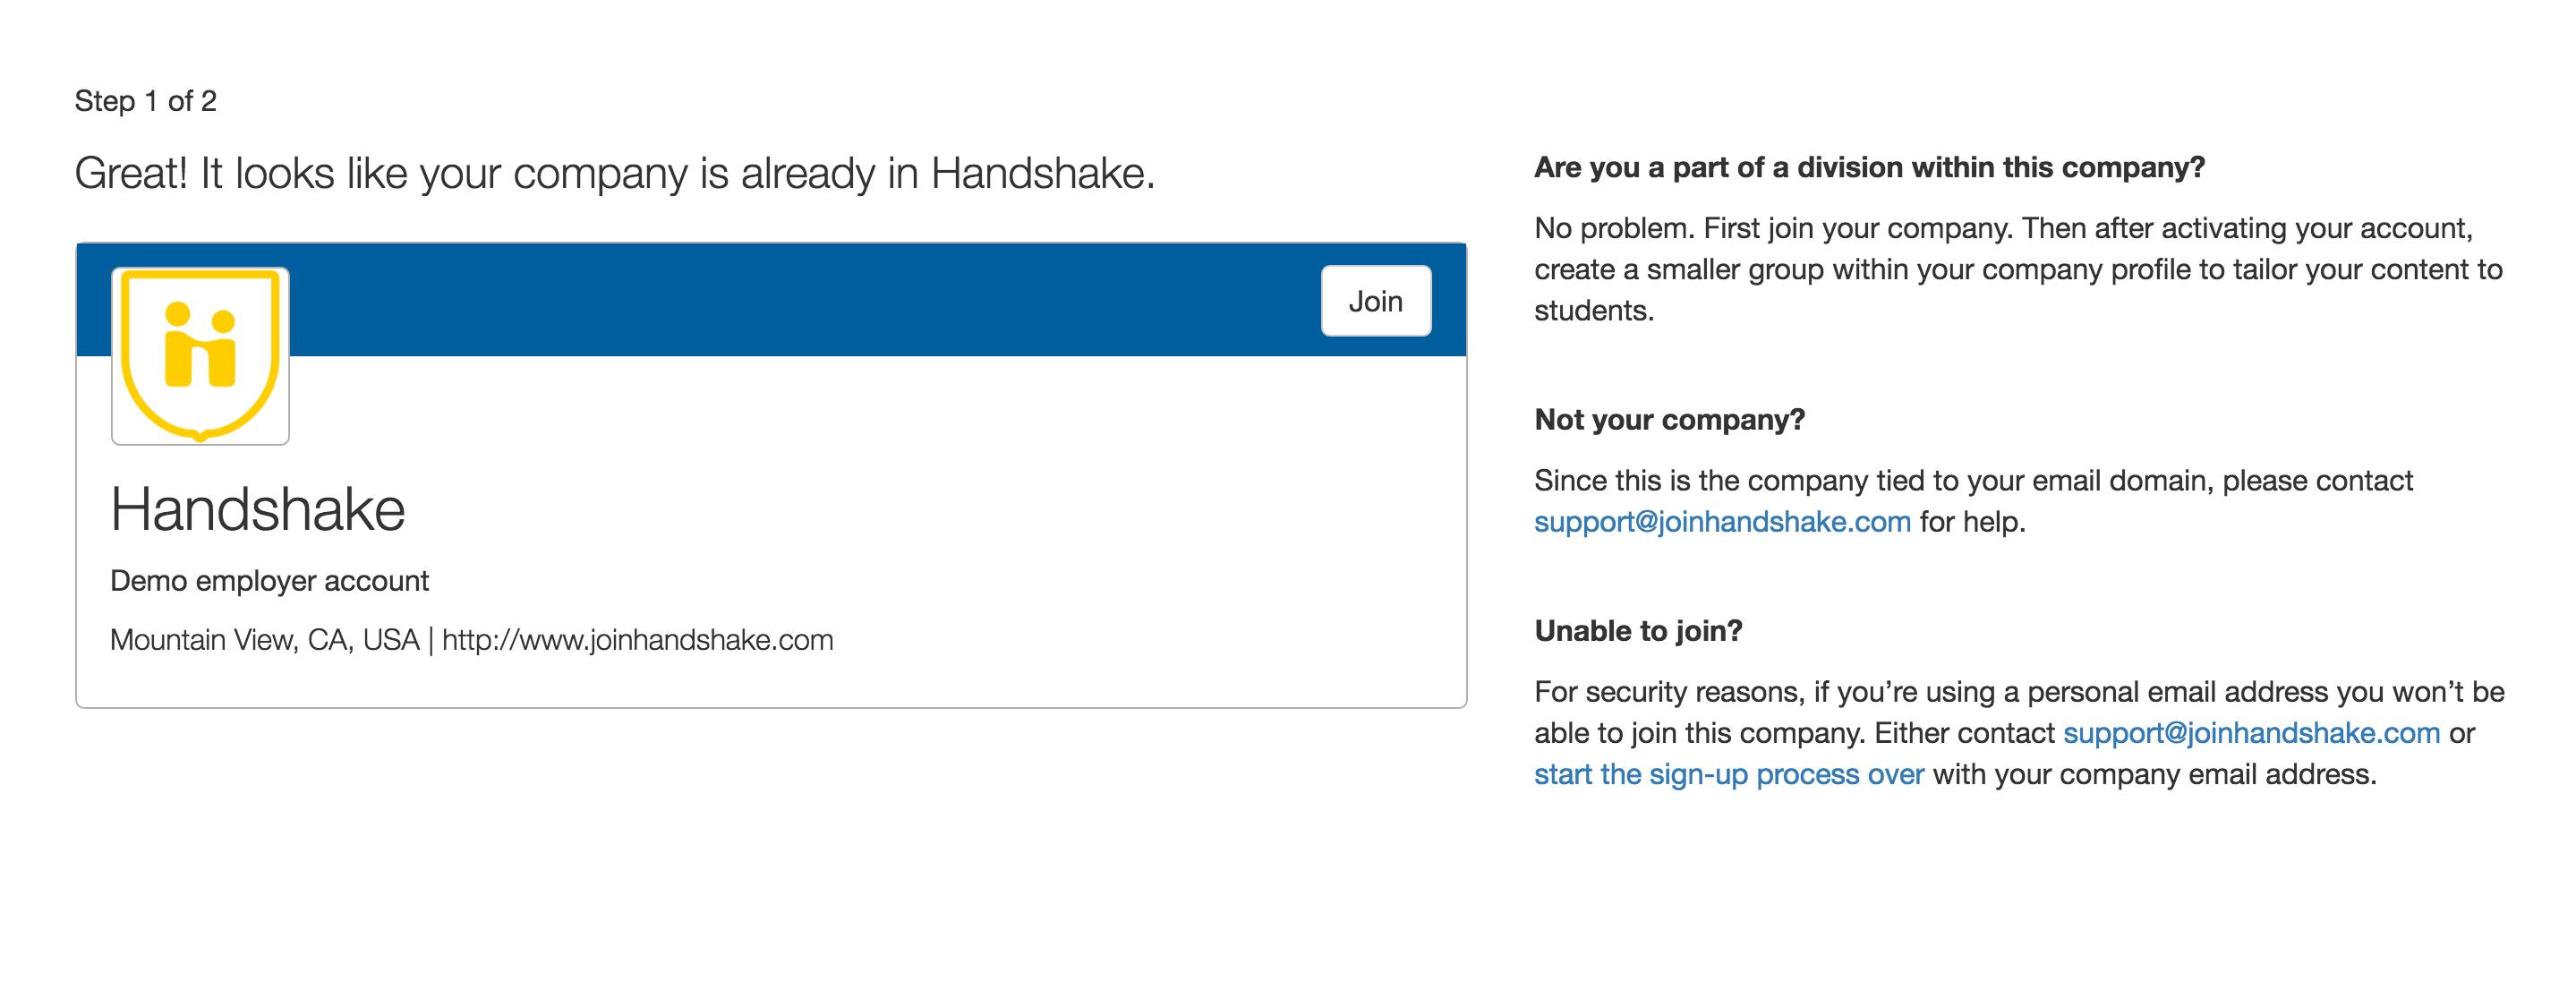 Handshake confirmation screenshot